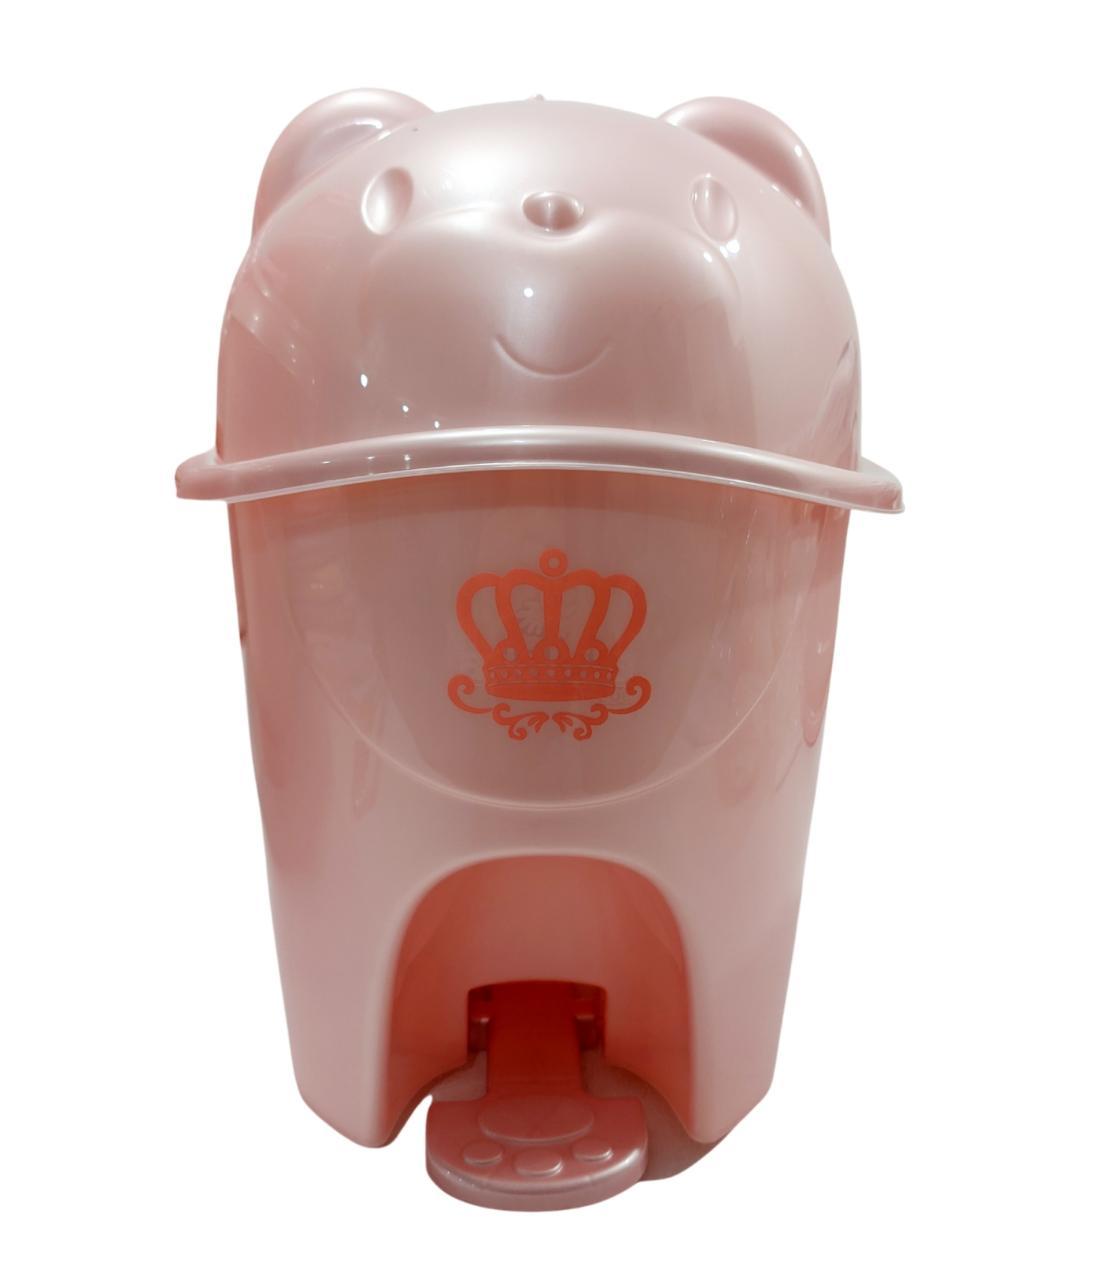 Lixeira Majestic C/ Pedal - 6,5 Litros - Cores Variadas - Adoleta Bebê